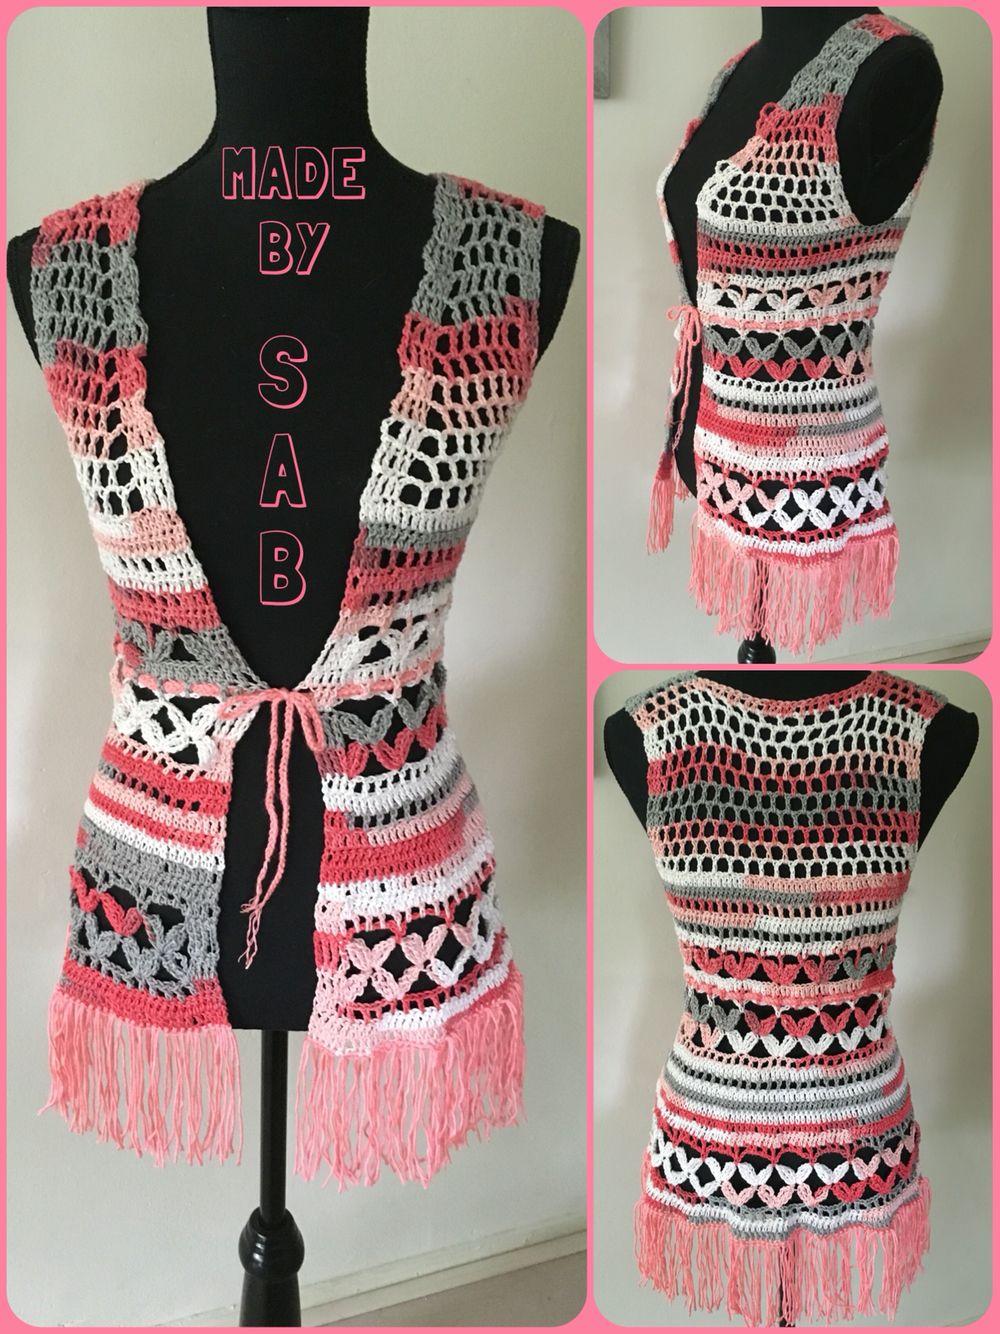 Vestje gehaakt - boho - franjes - Rio Jacquard - verloopgaren - patroon: www.garnstudio.com - Summer Bloss Vest - #crochet Made by Sab